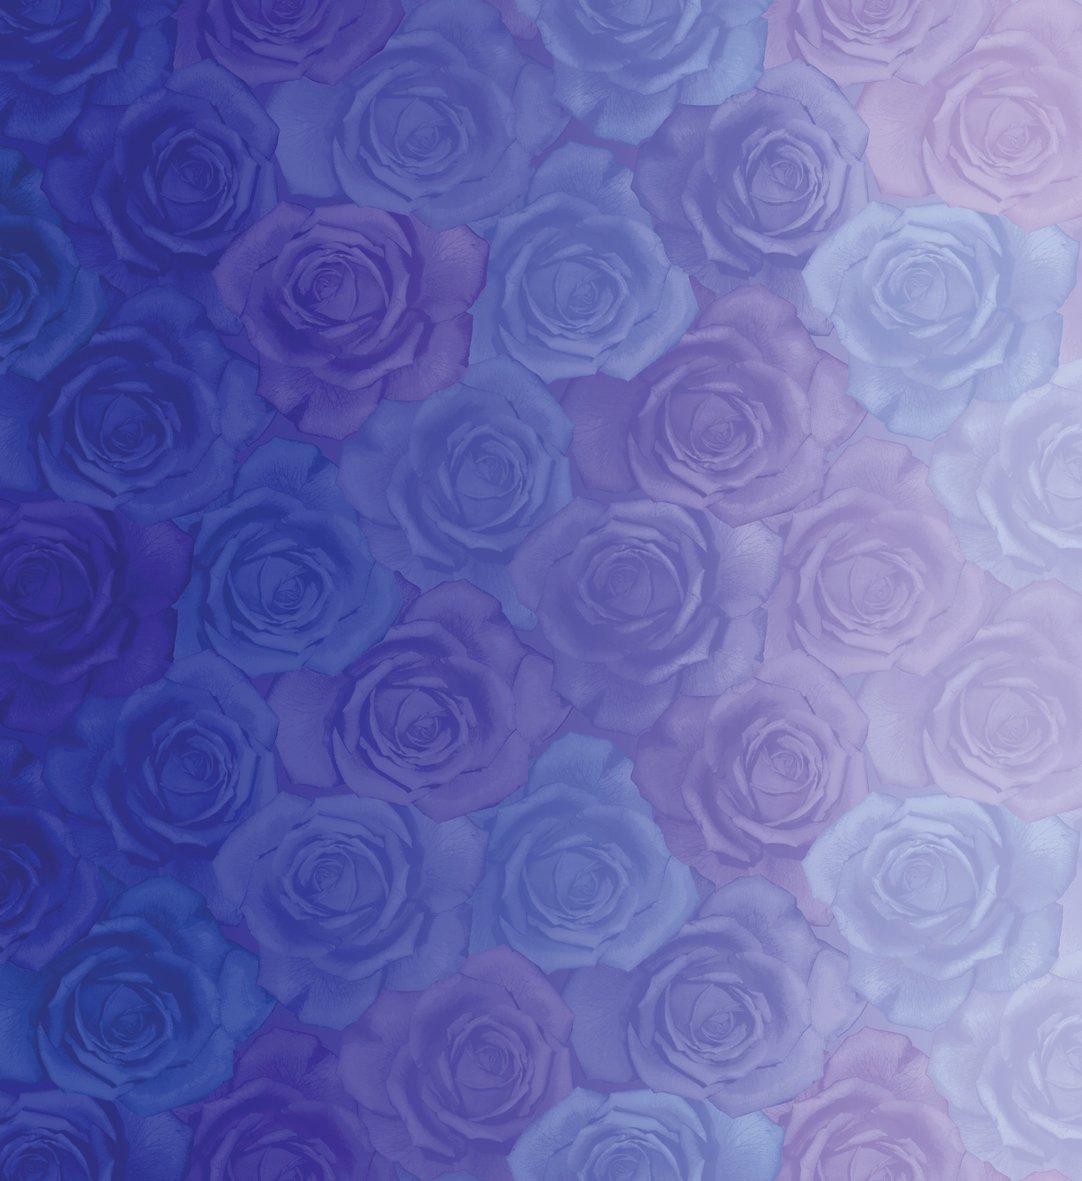 Gradients 33364-12D Blues from Moda